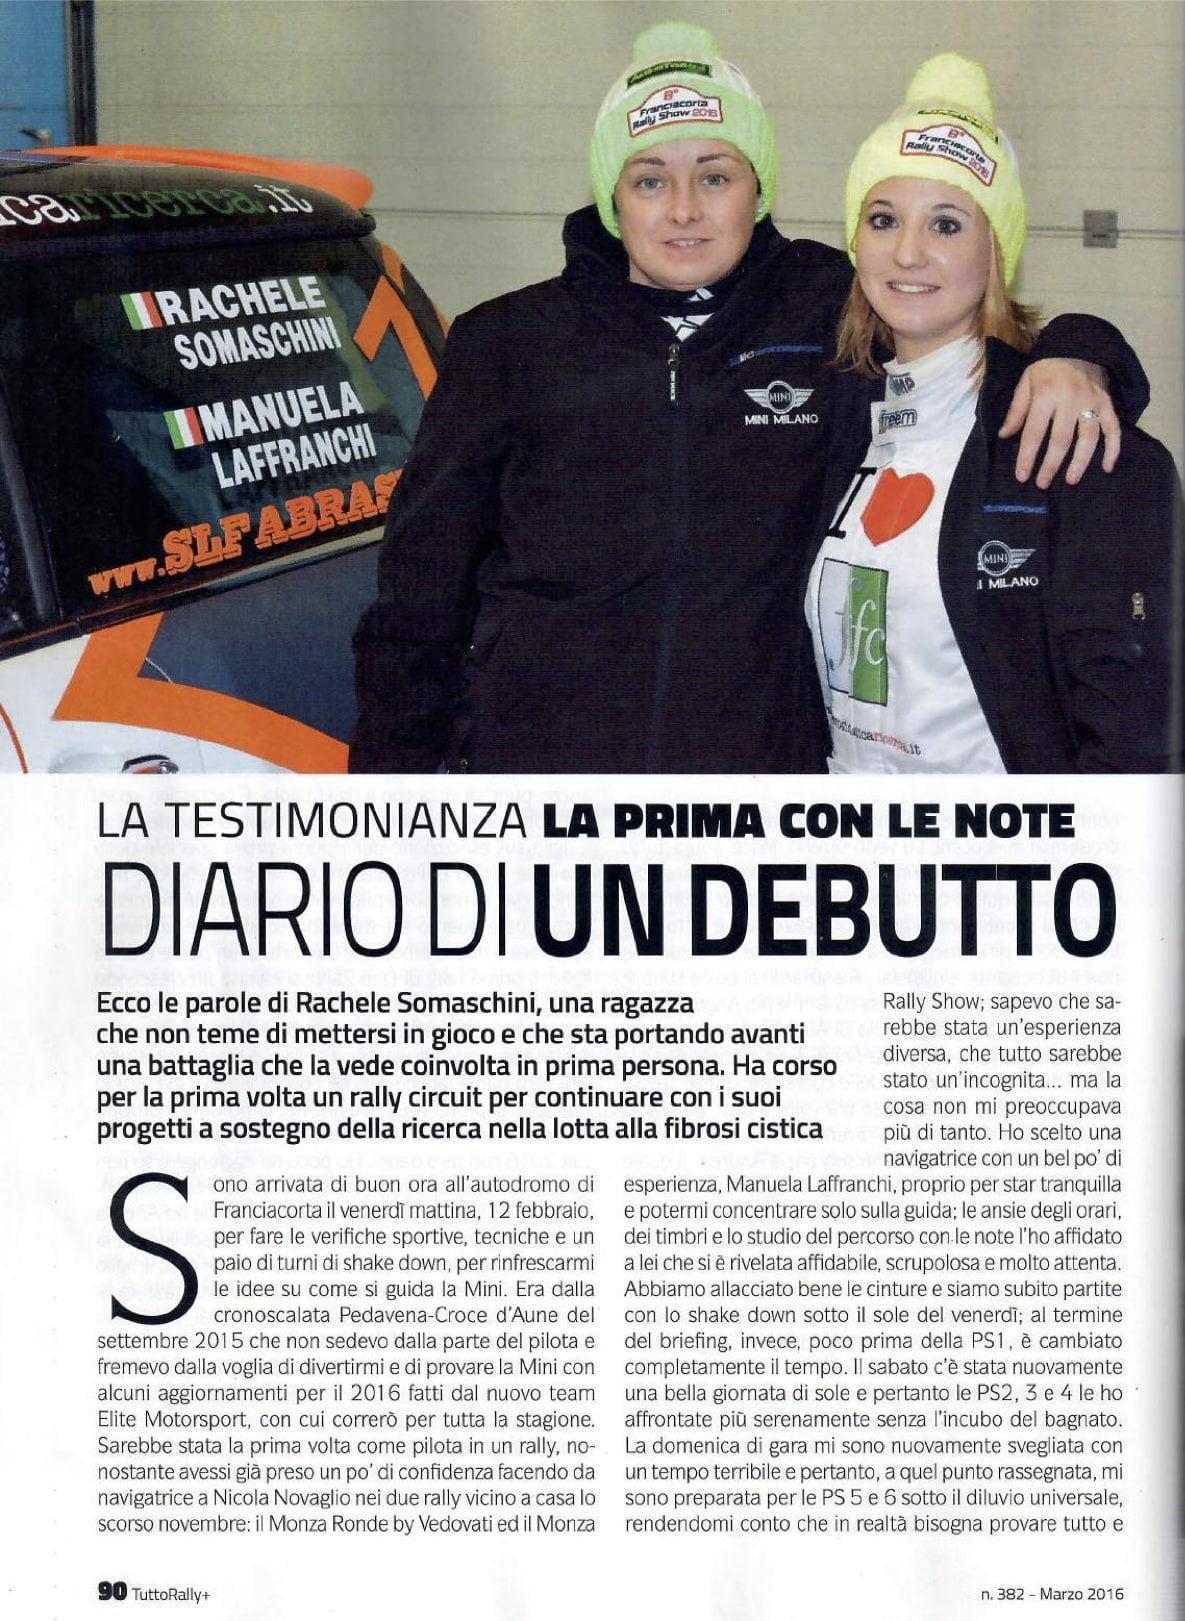 TuttoRally+ Rachele Somaschini con Manuela